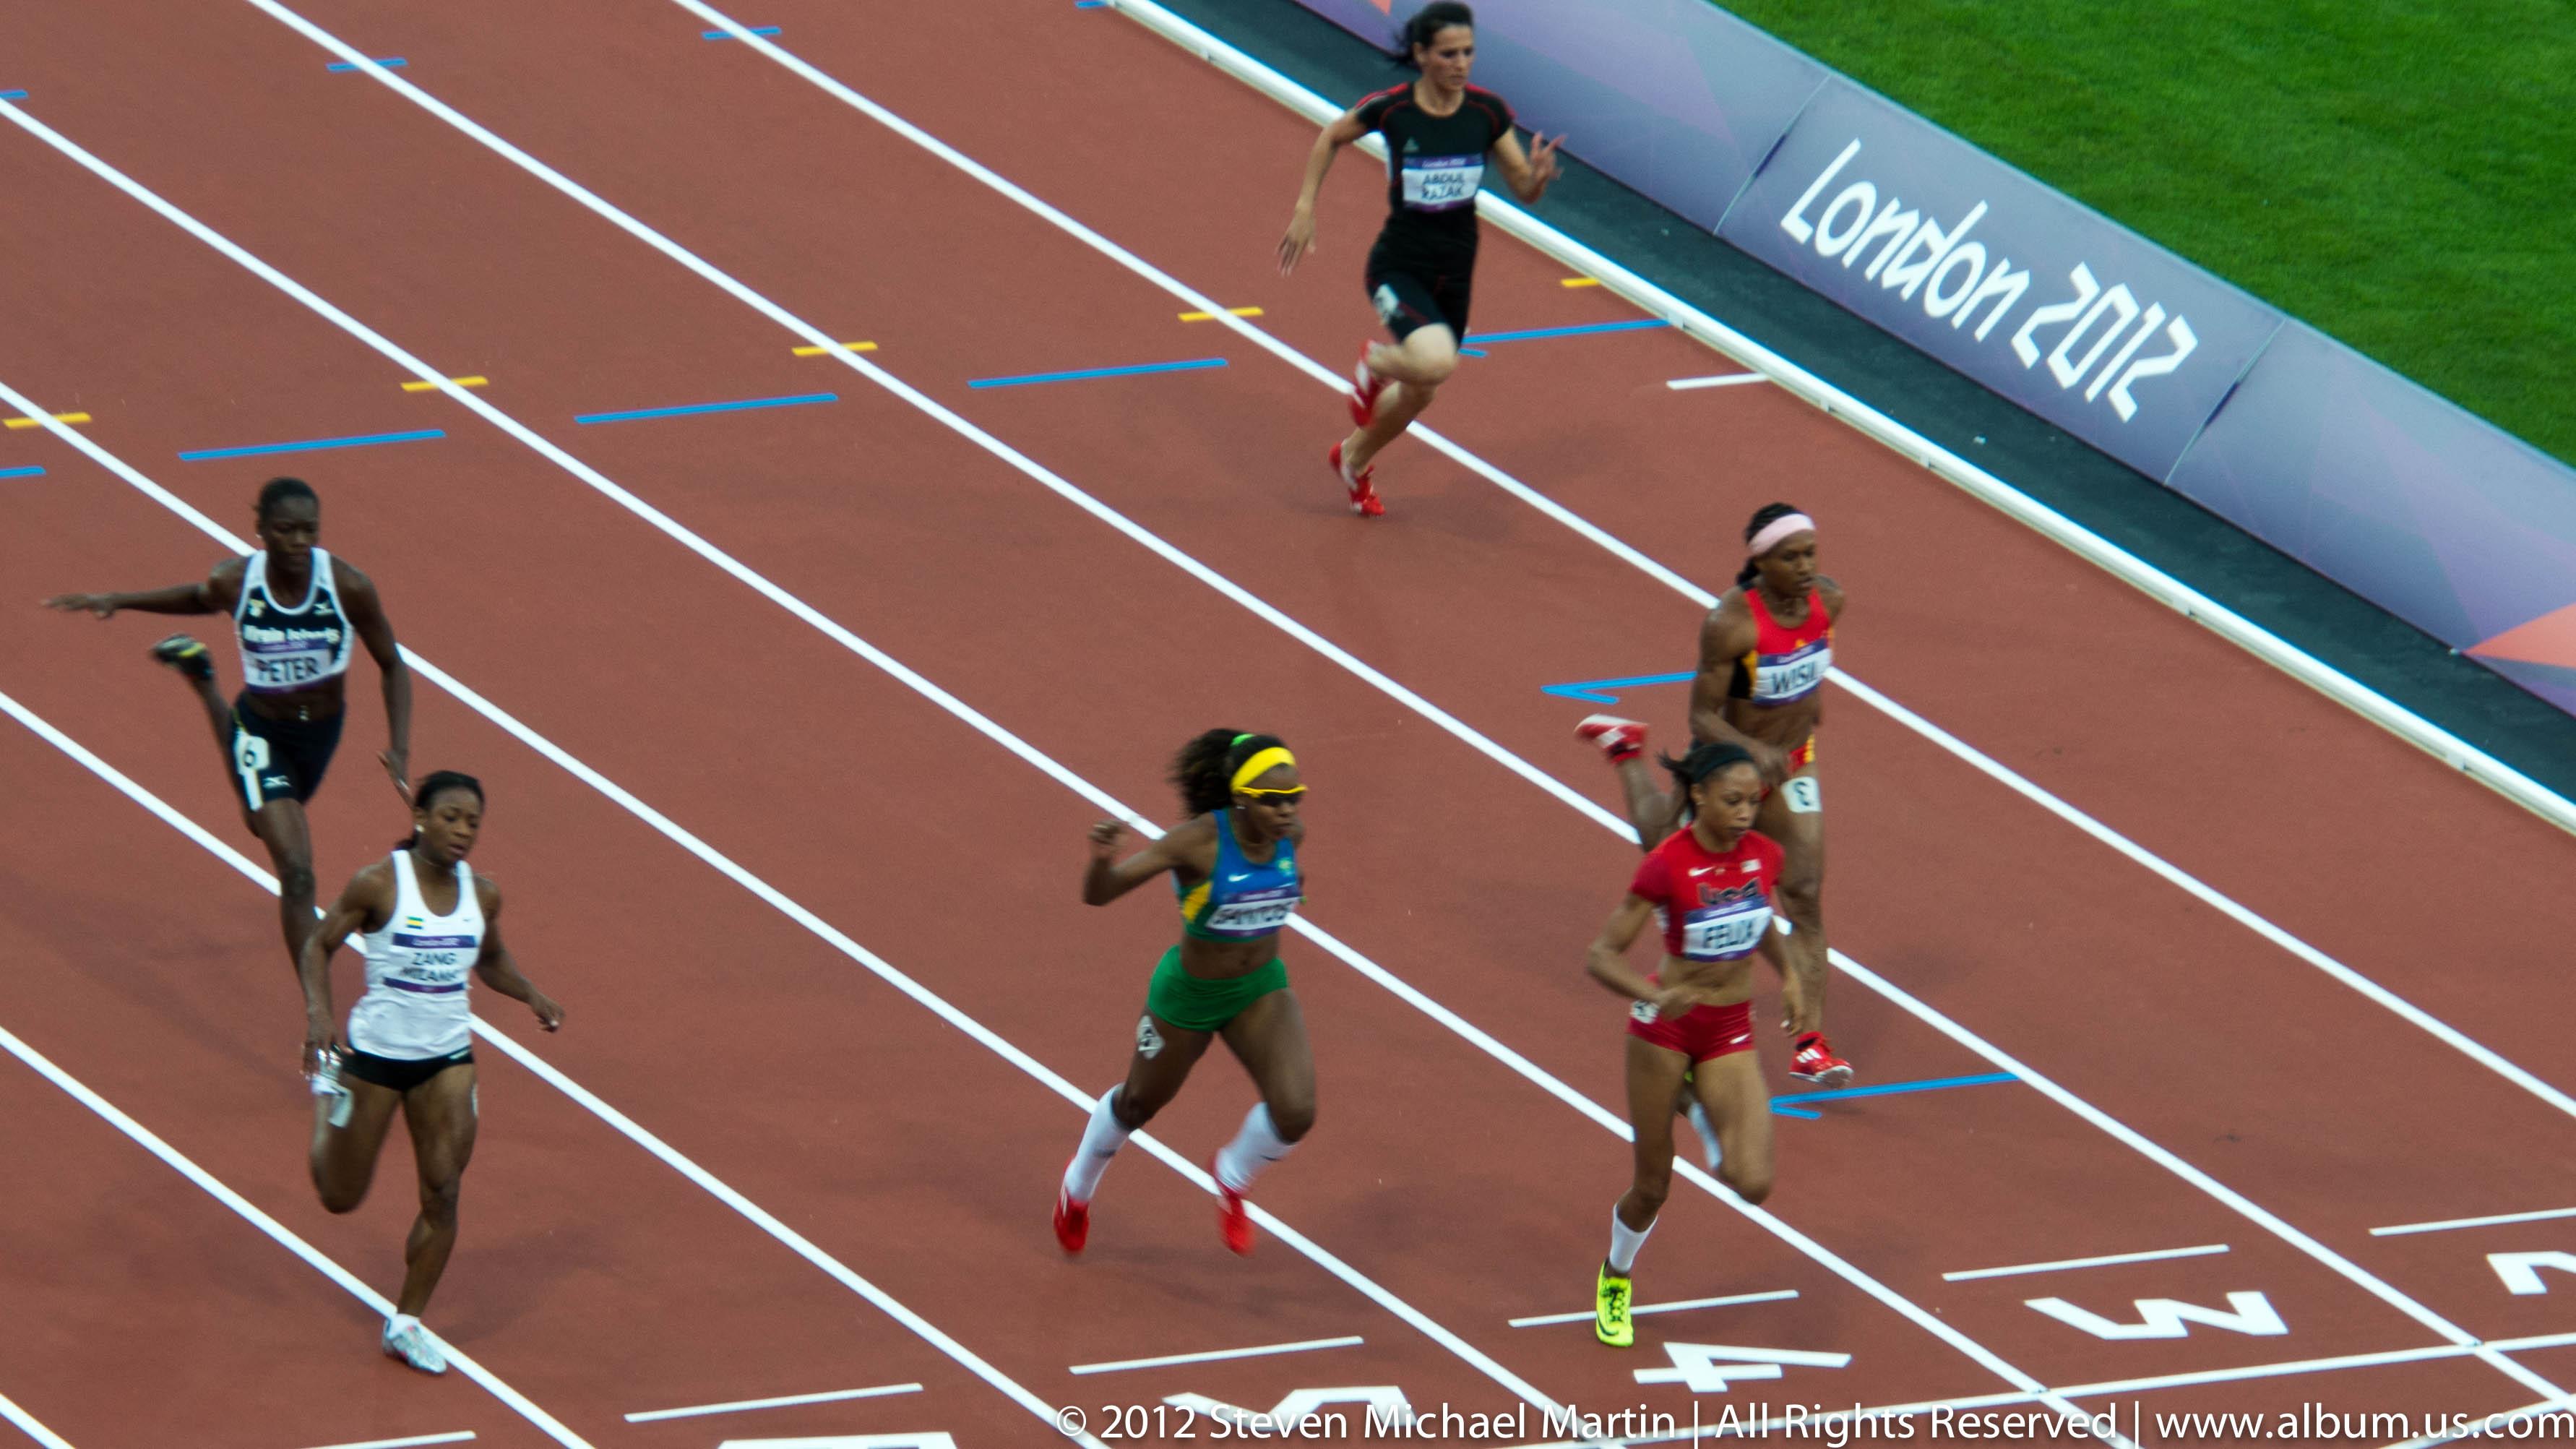 SMartin_2012 Olympics Athletics_20120803_016